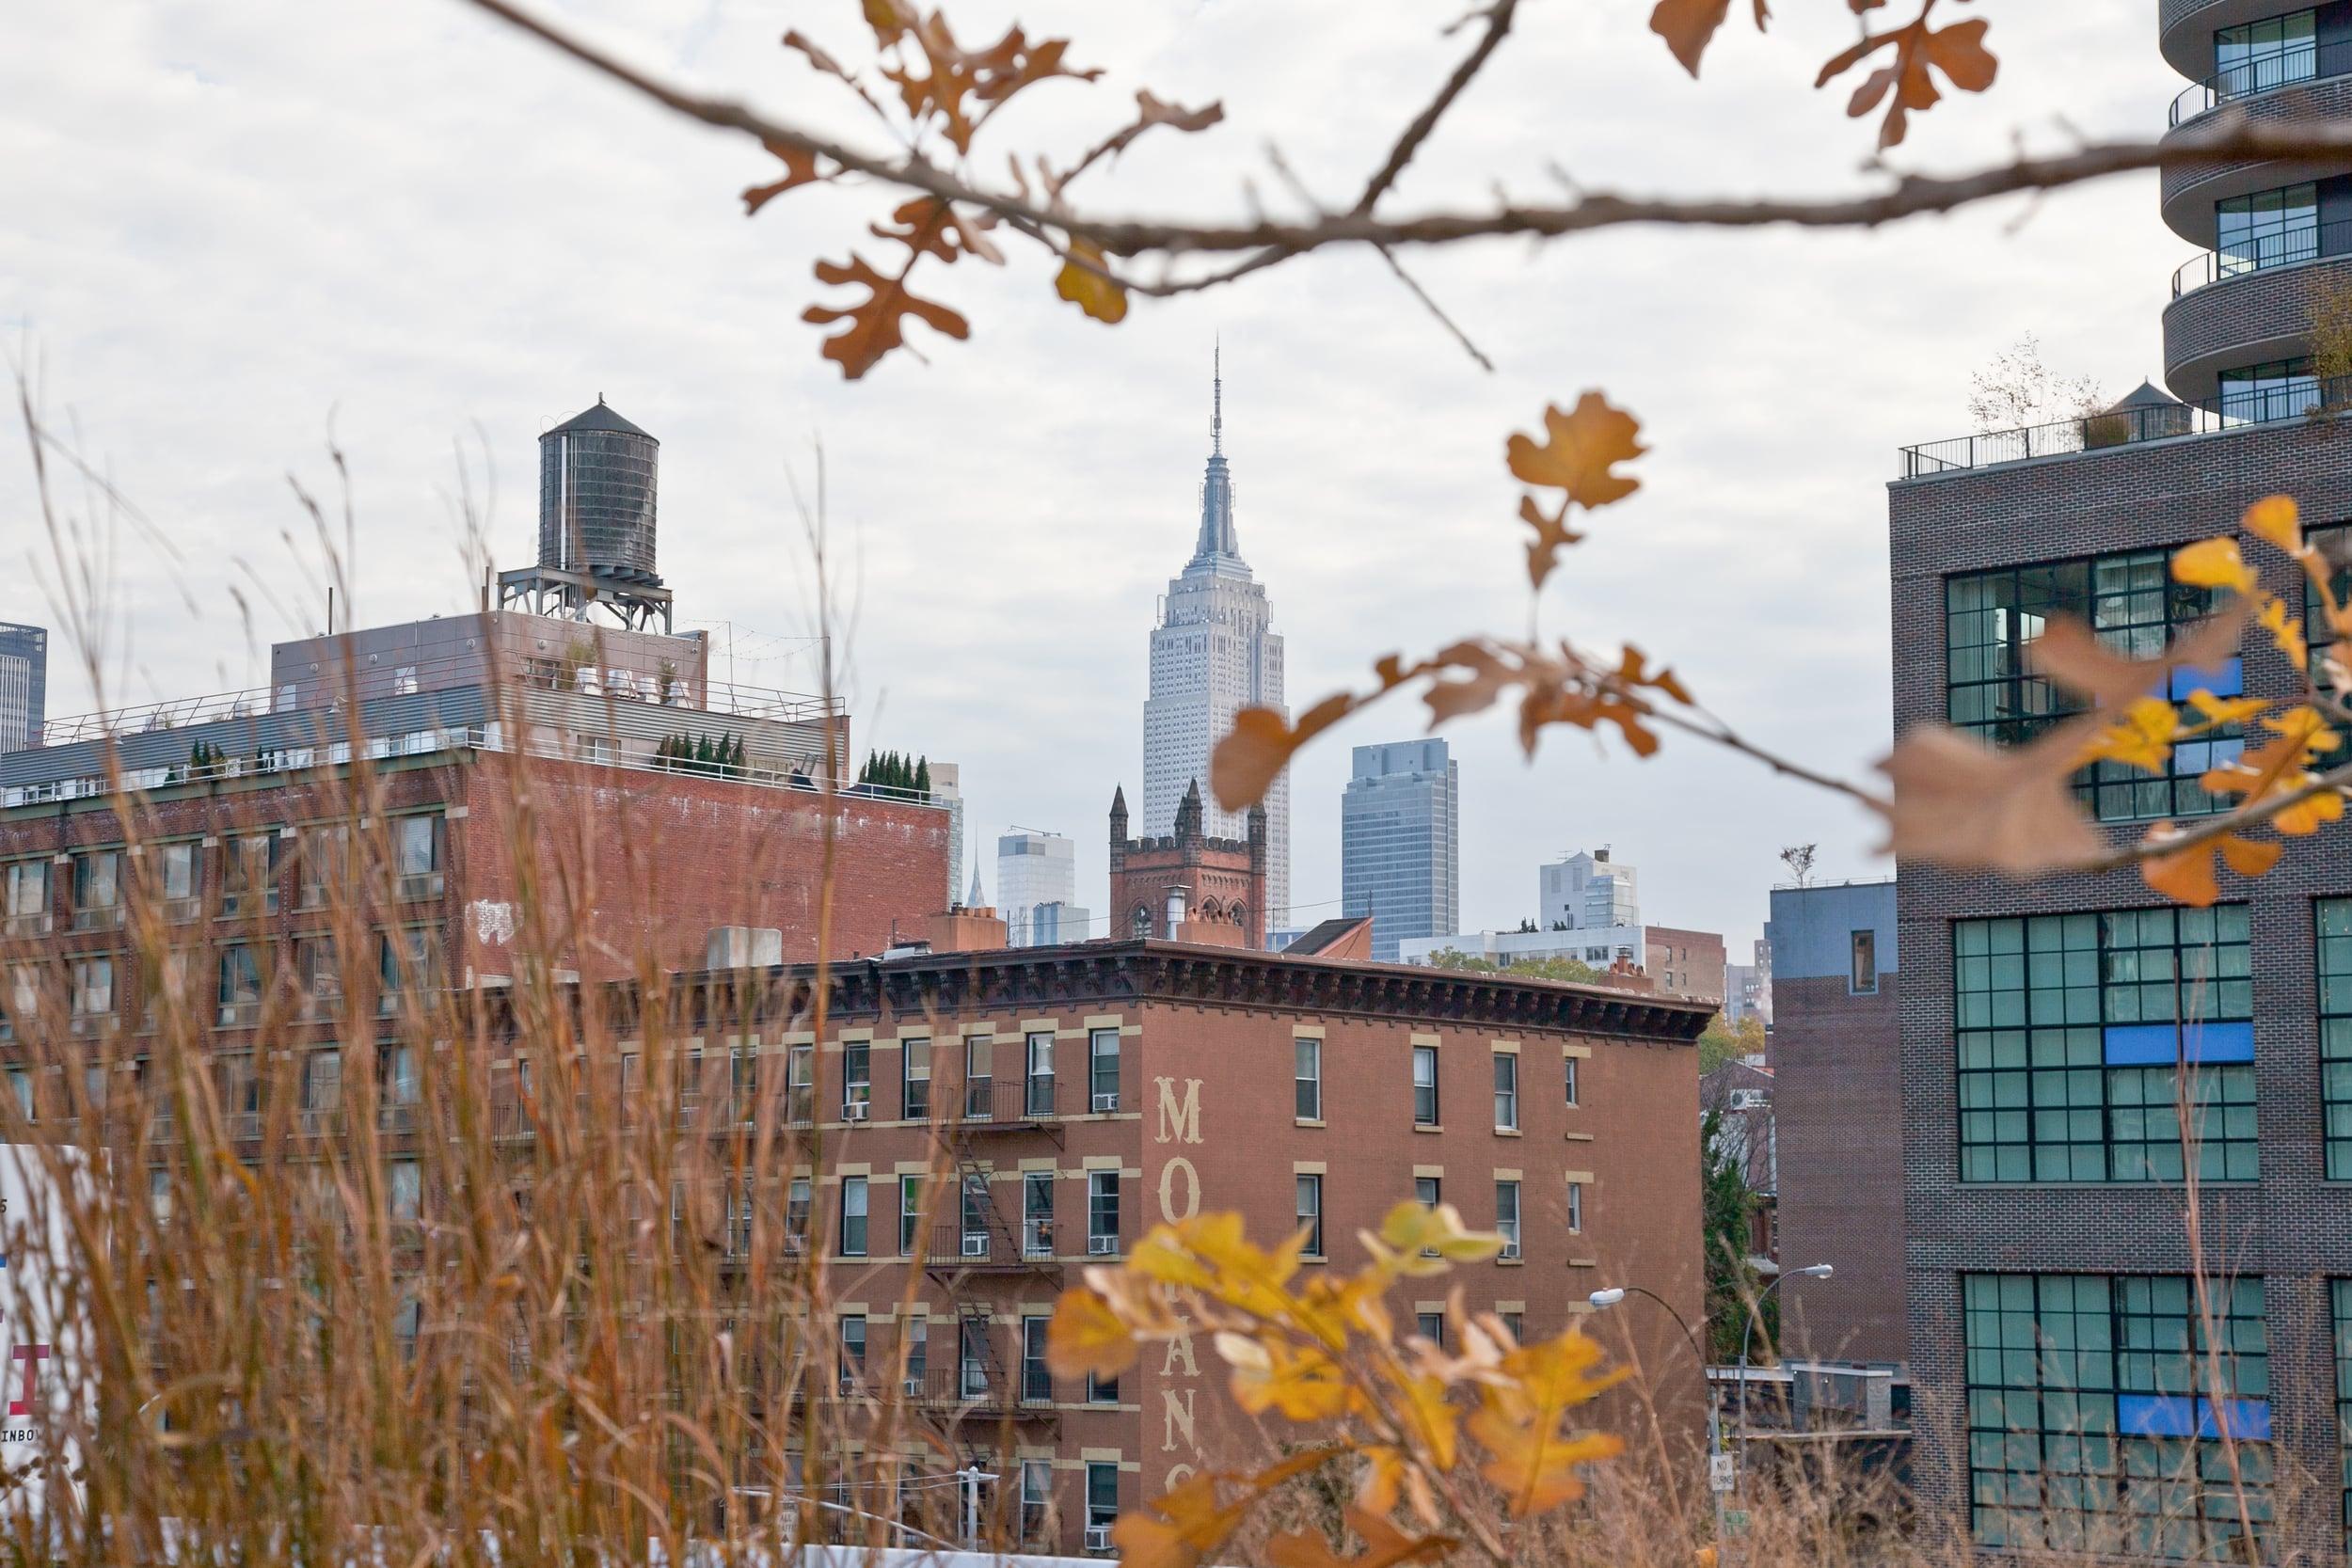 trisa-taro-empire state building-fall-new york city.jpg